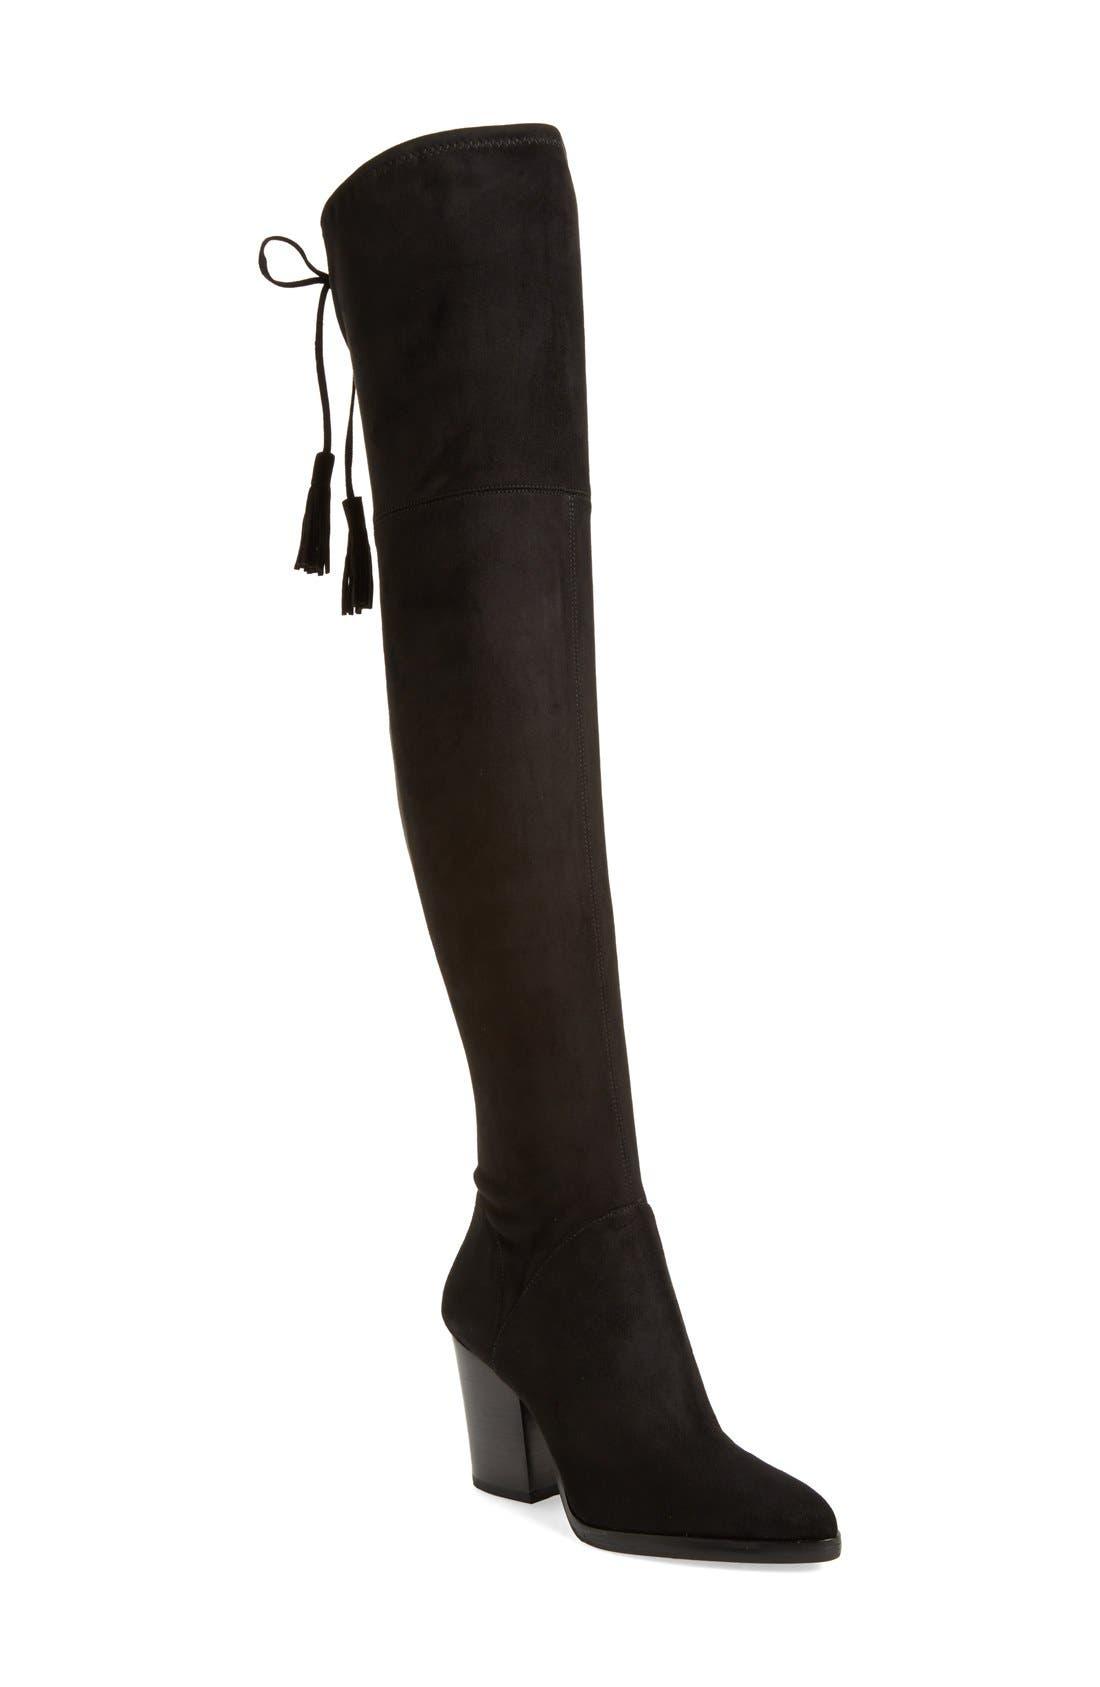 Alternate Image 1 Selected - Marc Fisher LTD 'Alinda' Over the Knee Boot (Women)